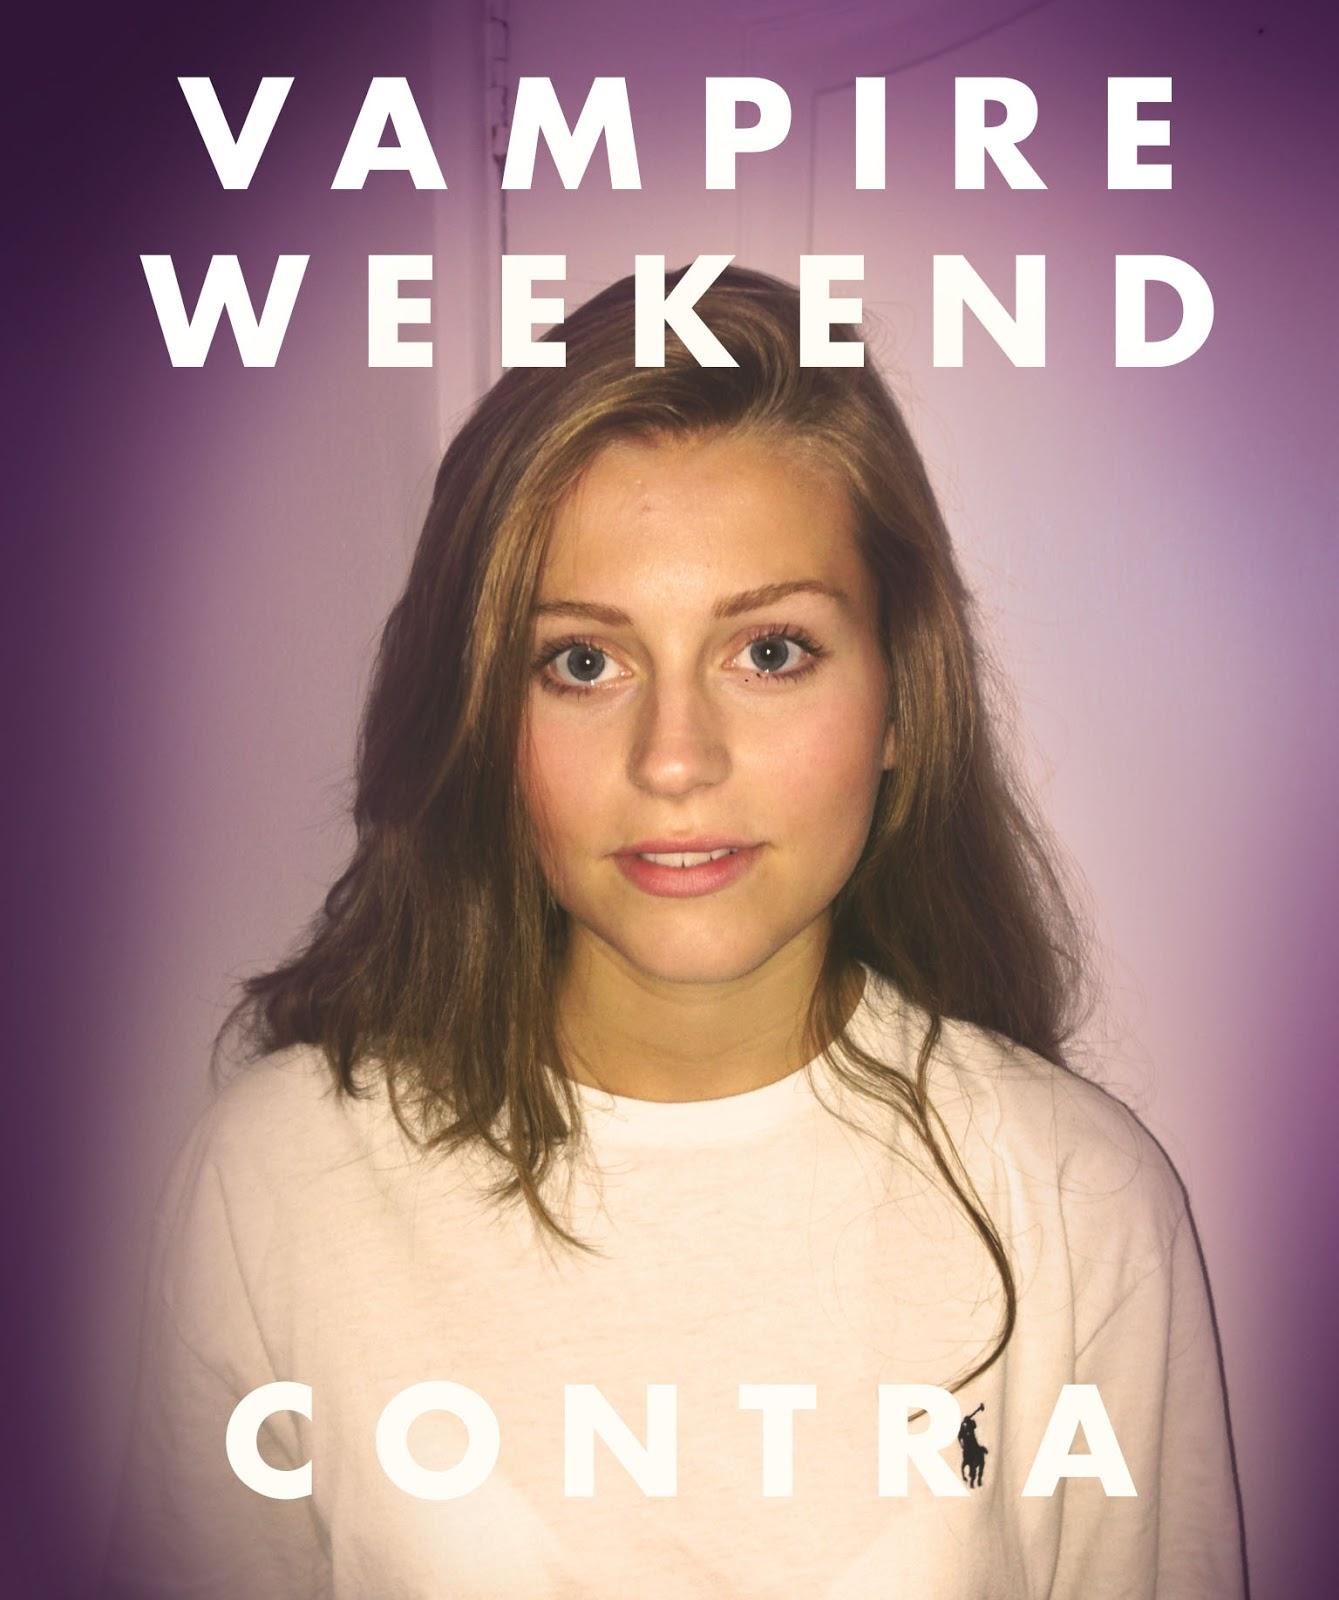 vampire weekend contra album cover